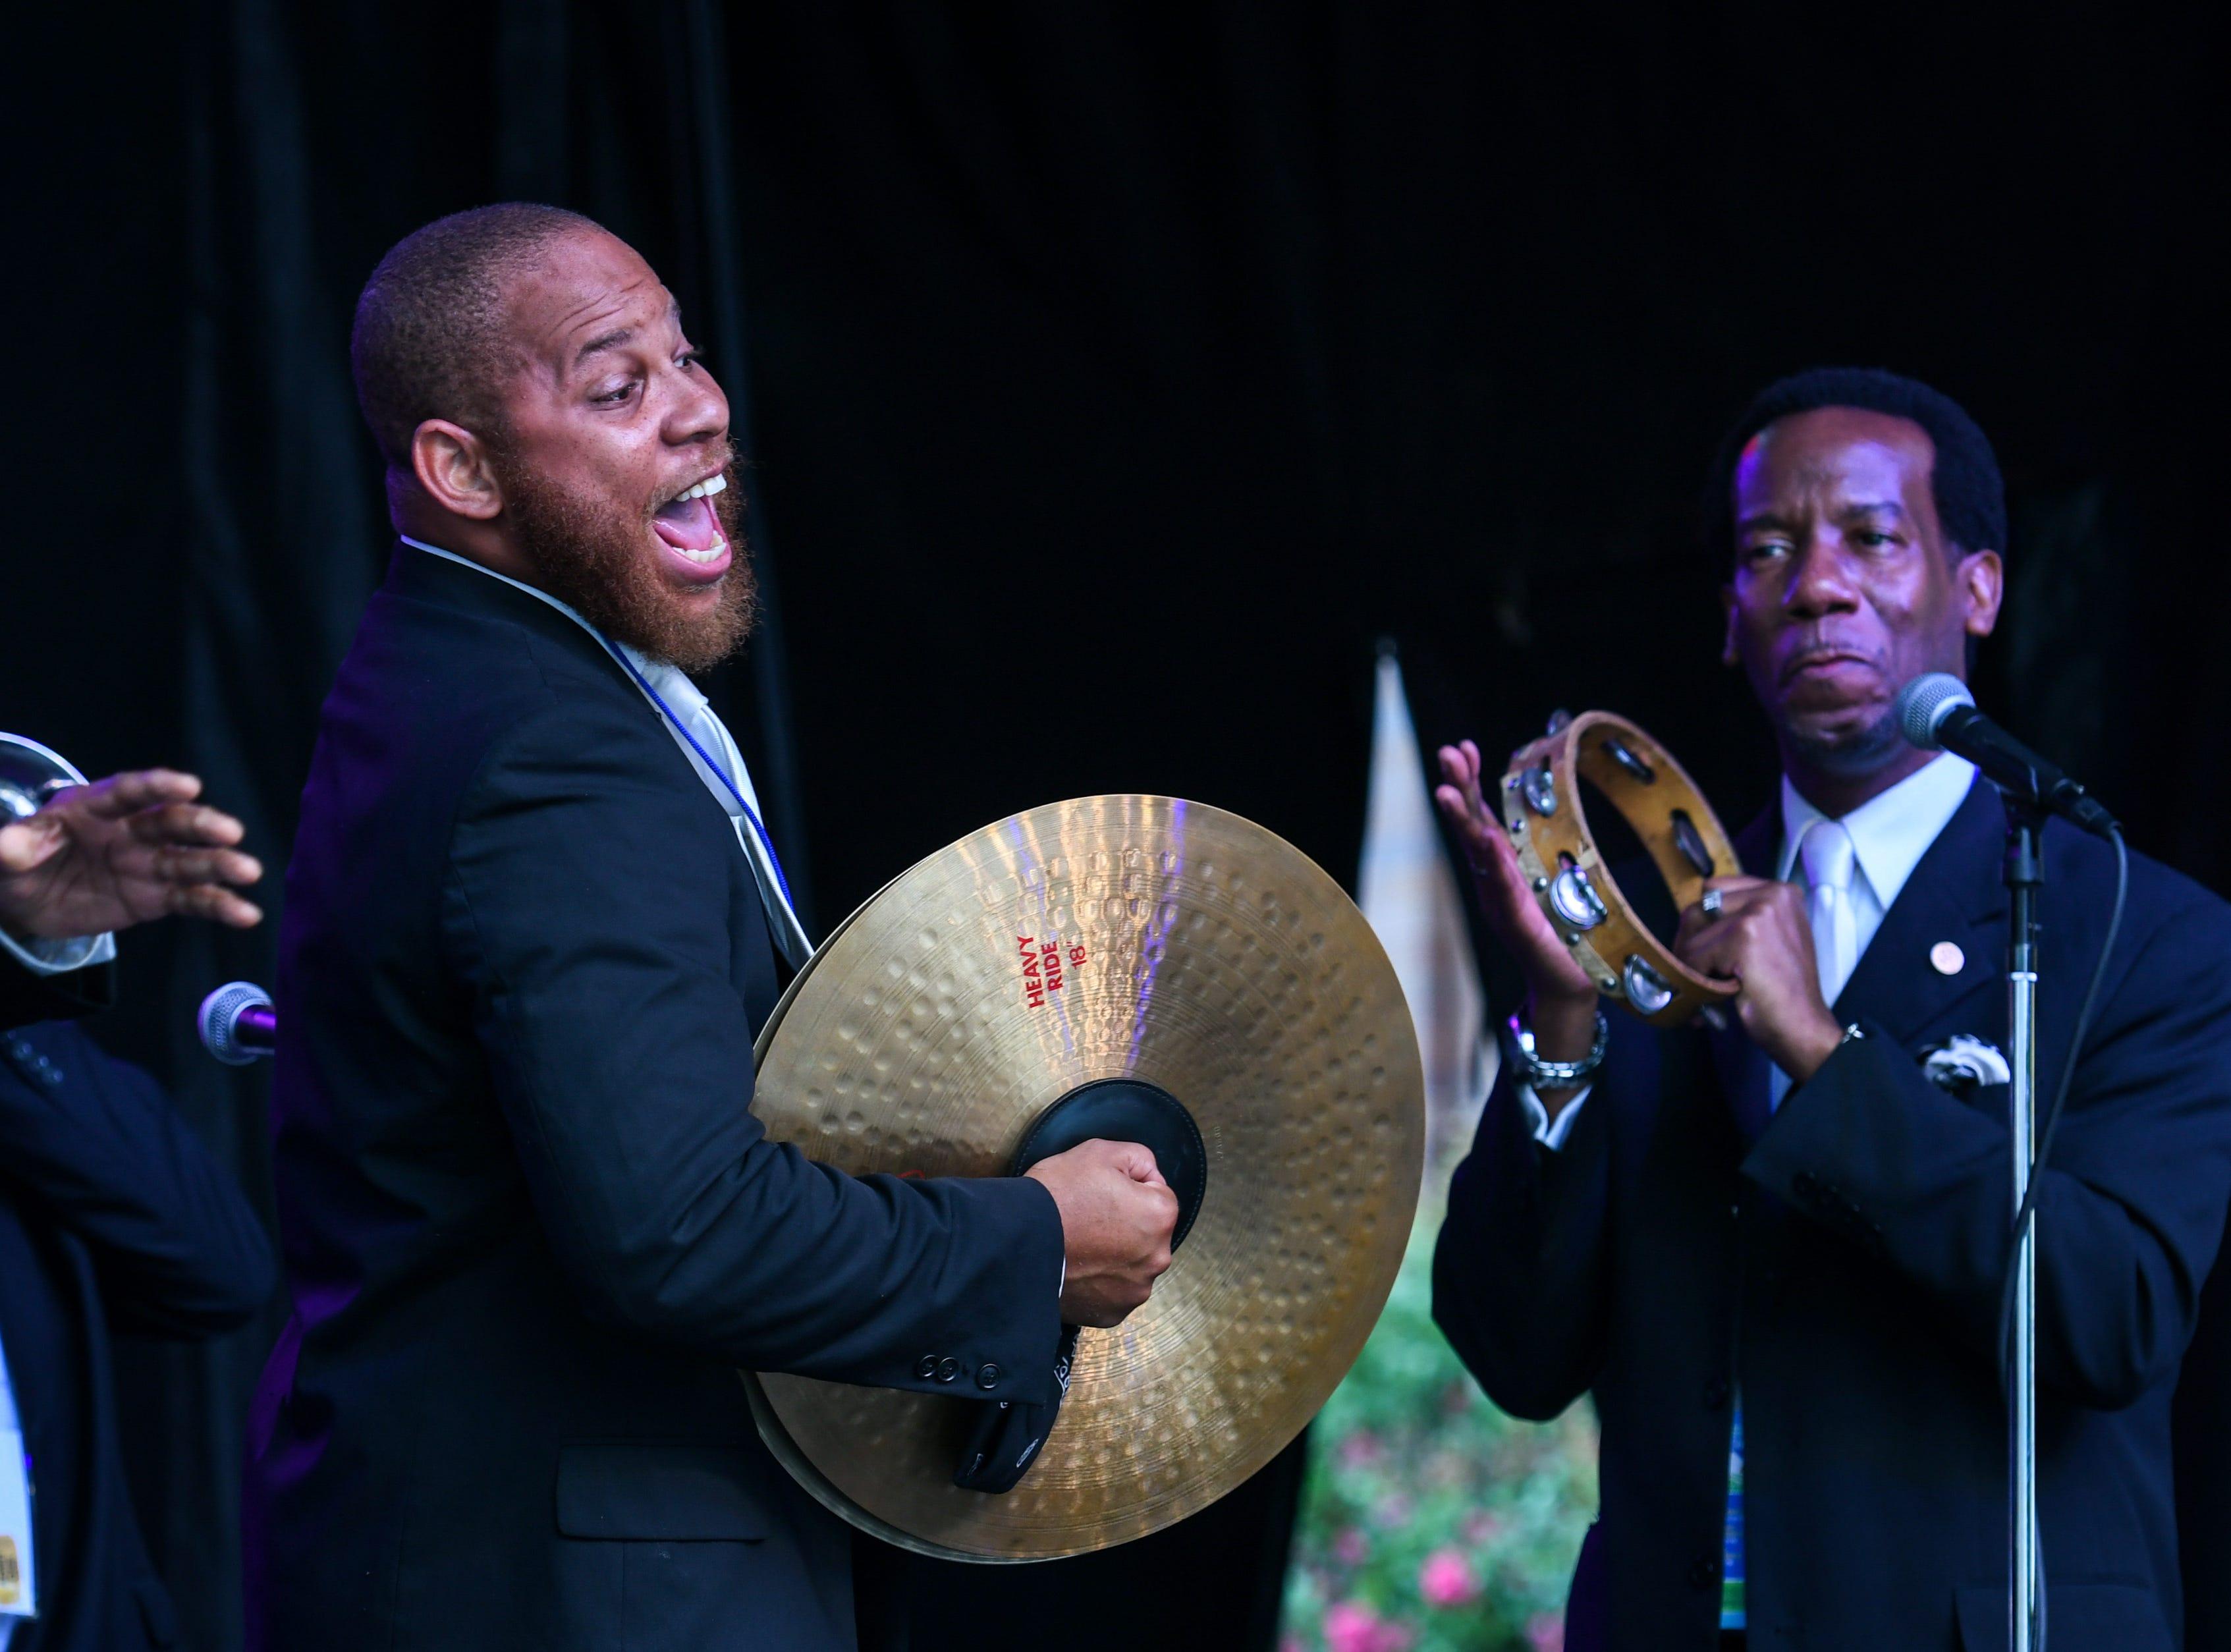 Mangum & Company perform at the National Folk Festival in Salisbury on Sunday, Sept. 9.